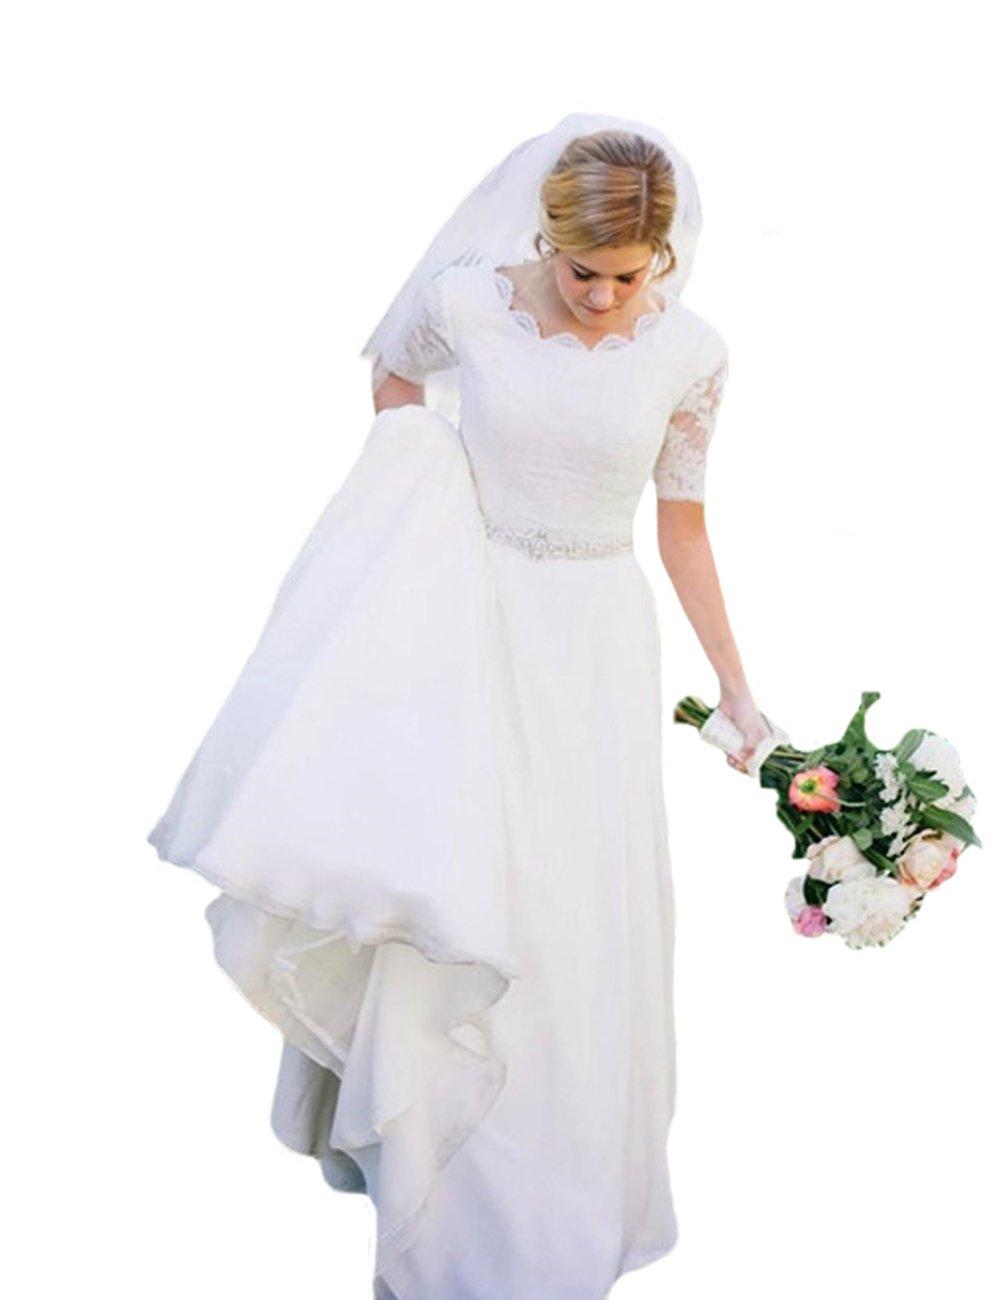 O.D.W Damen Lange Spitze Brautkleider Kurzarm Rustikale Vintage ...